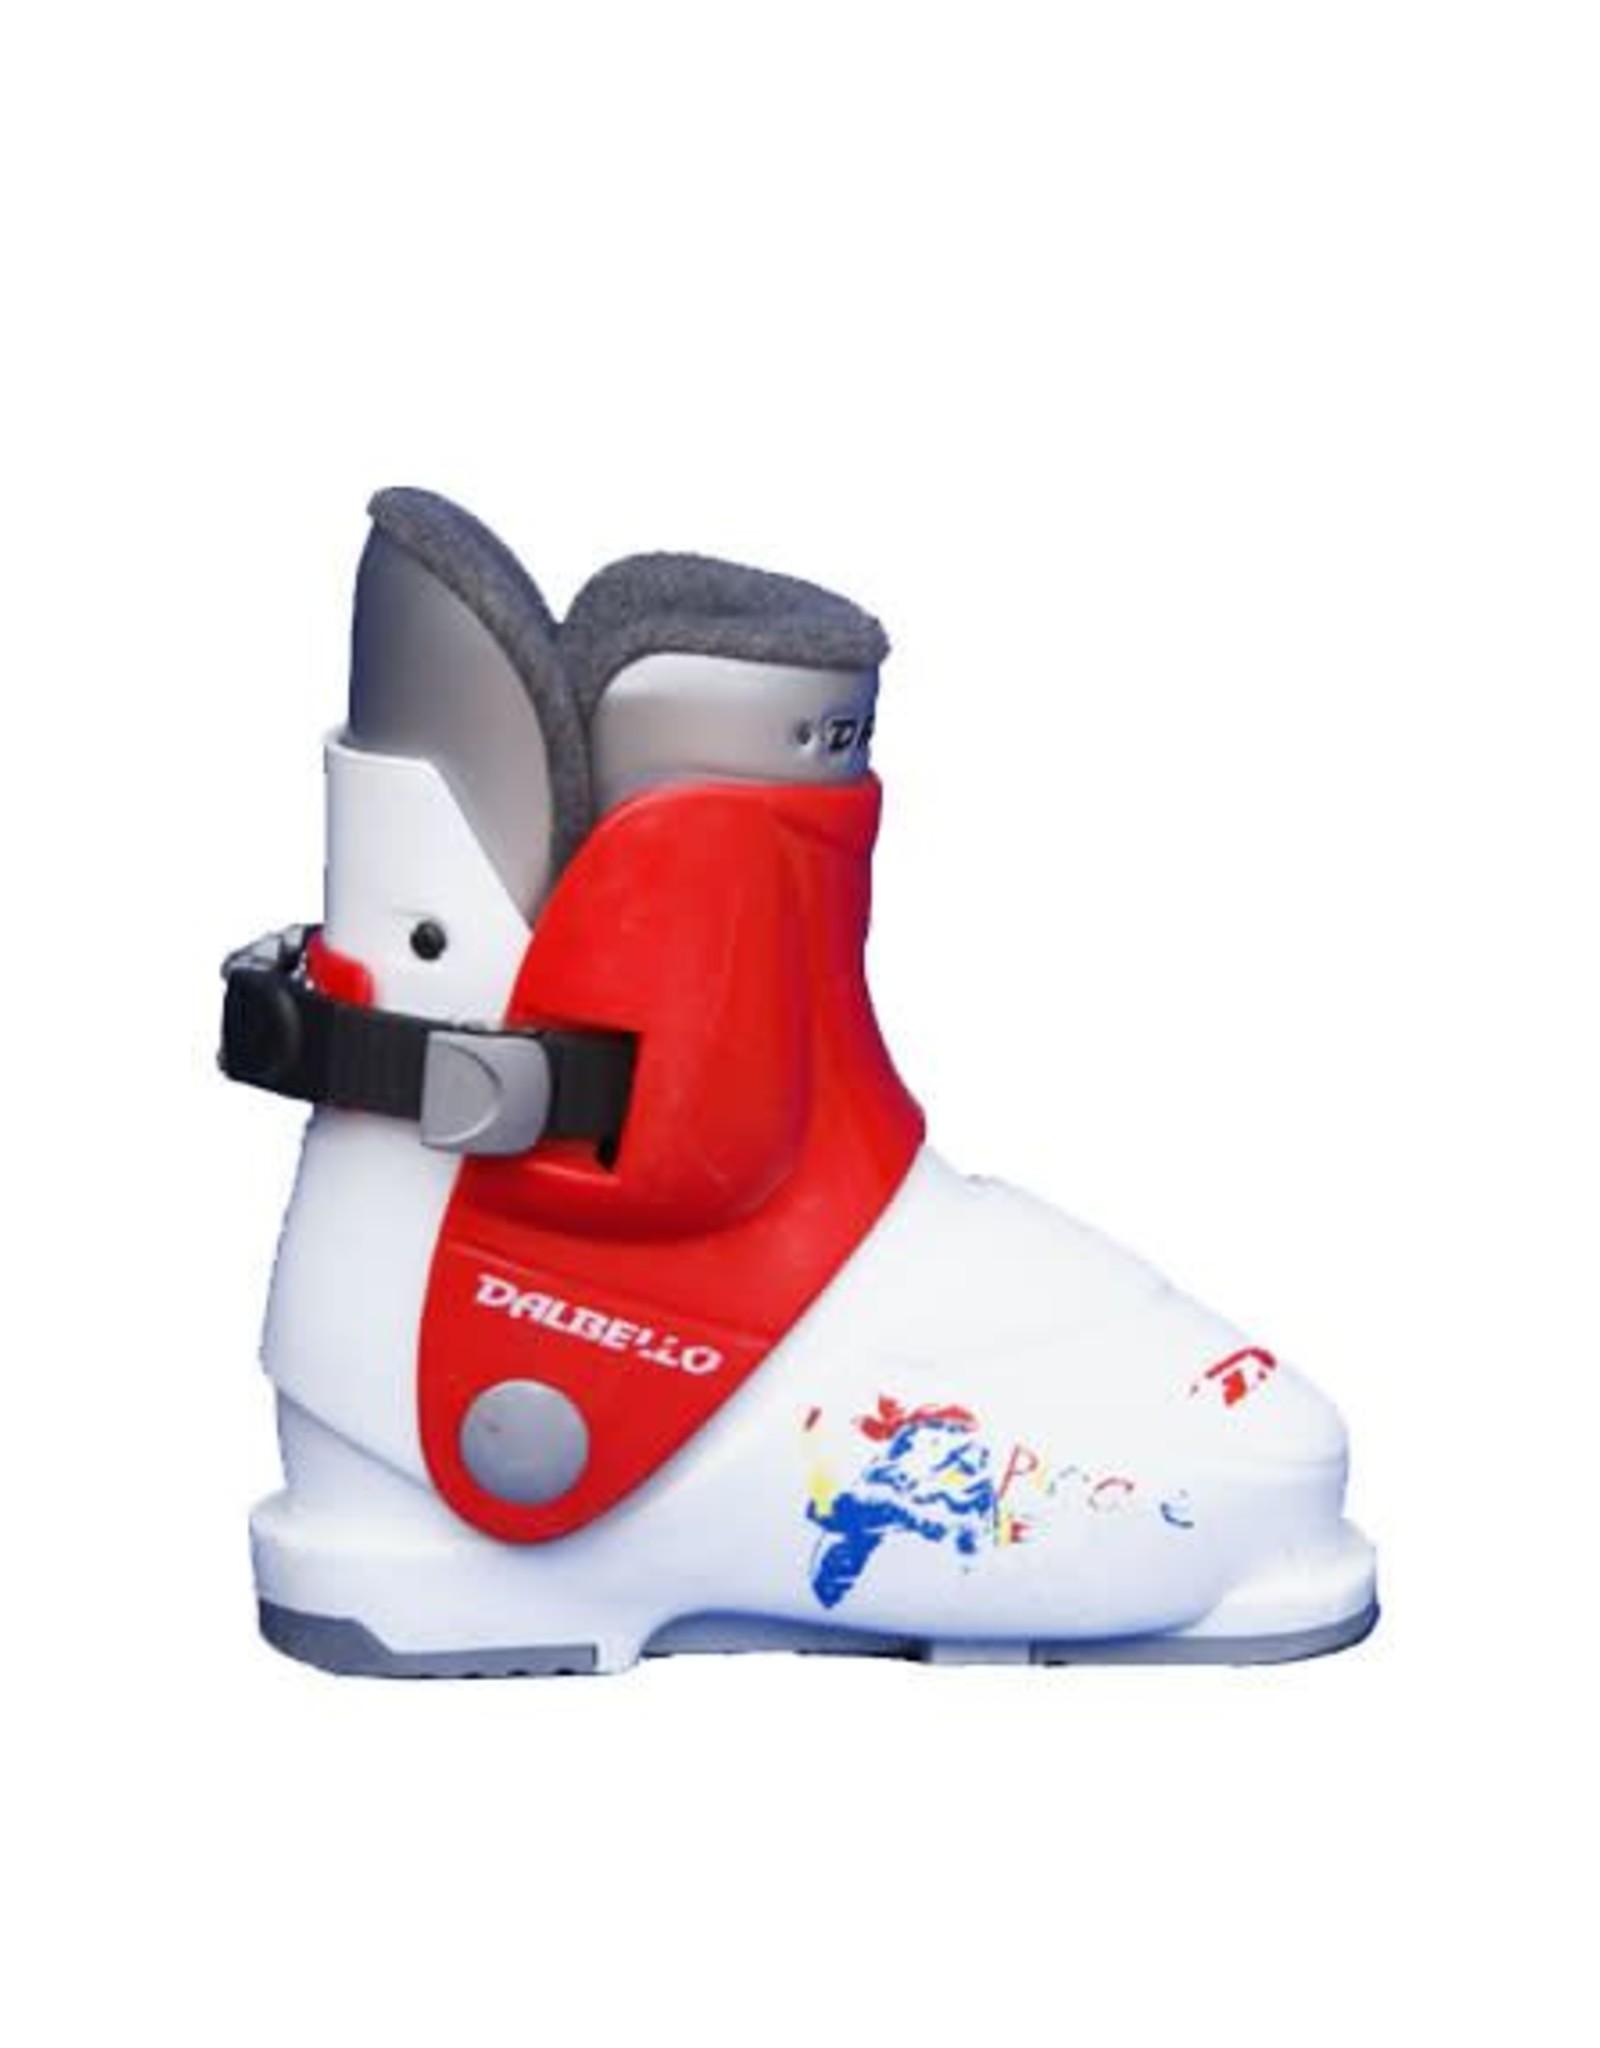 DALBELLO Skischoenen DALBELLO Pirates (rd/wit) Gebruikt 26 (mondo 16.5)